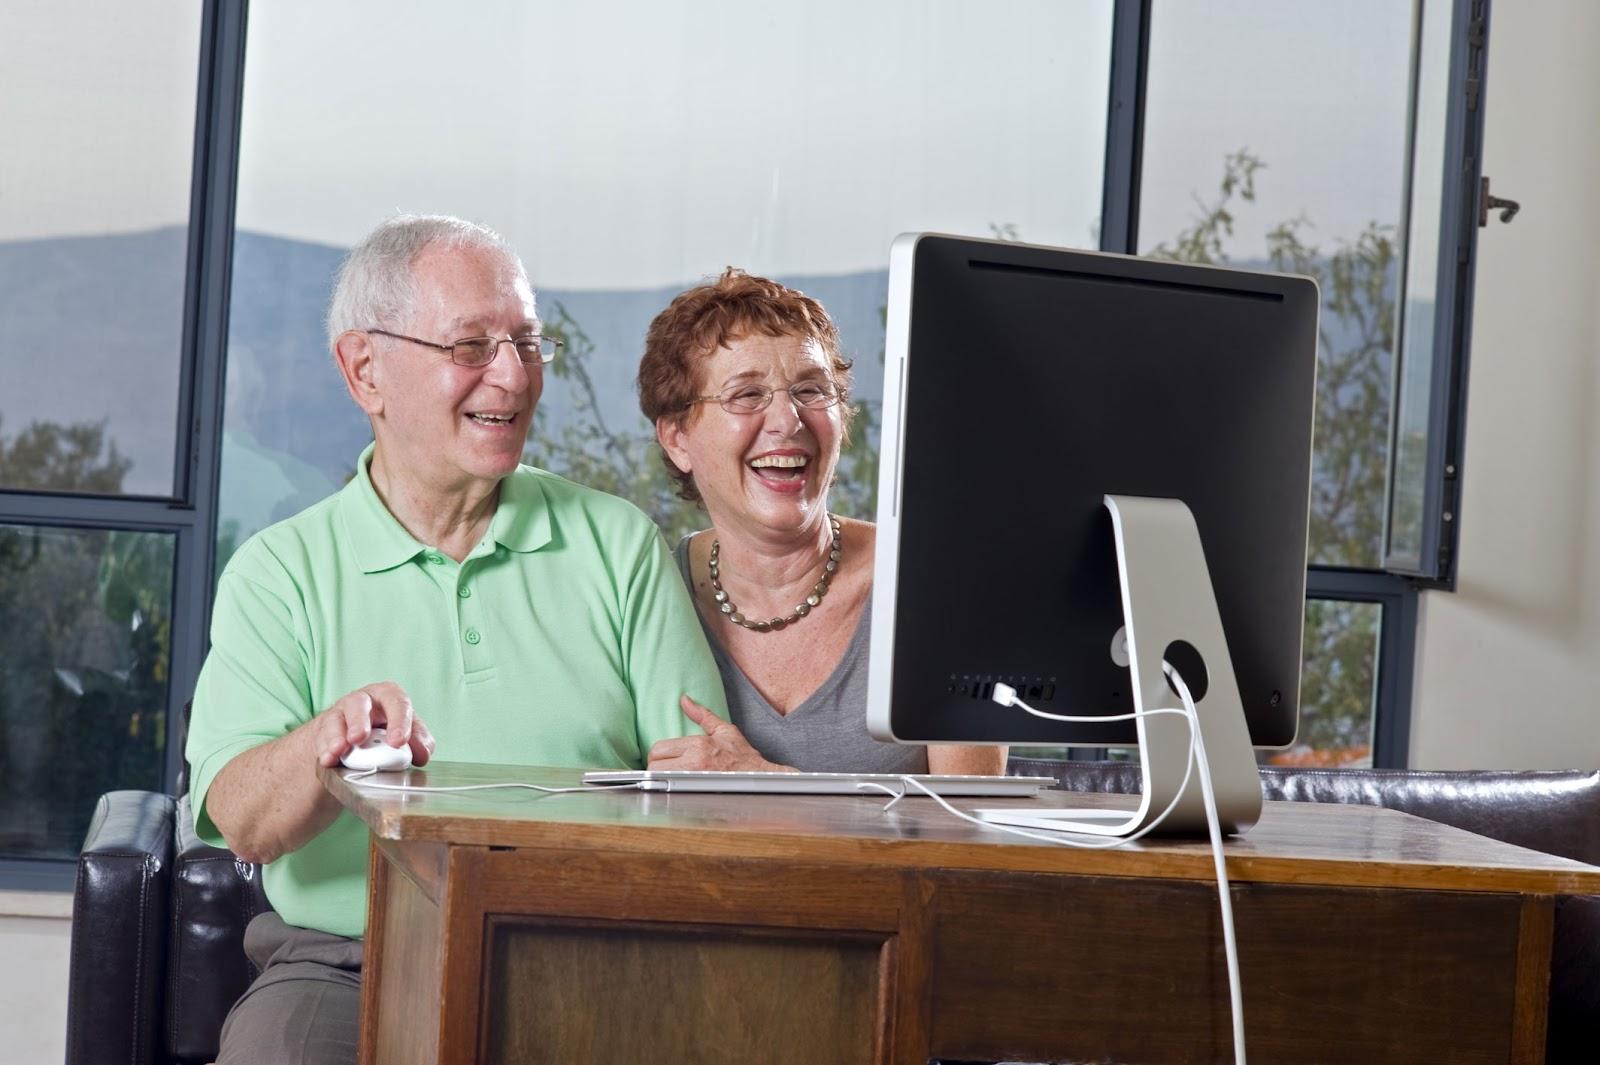 Senior Dating Online Services In Colorado